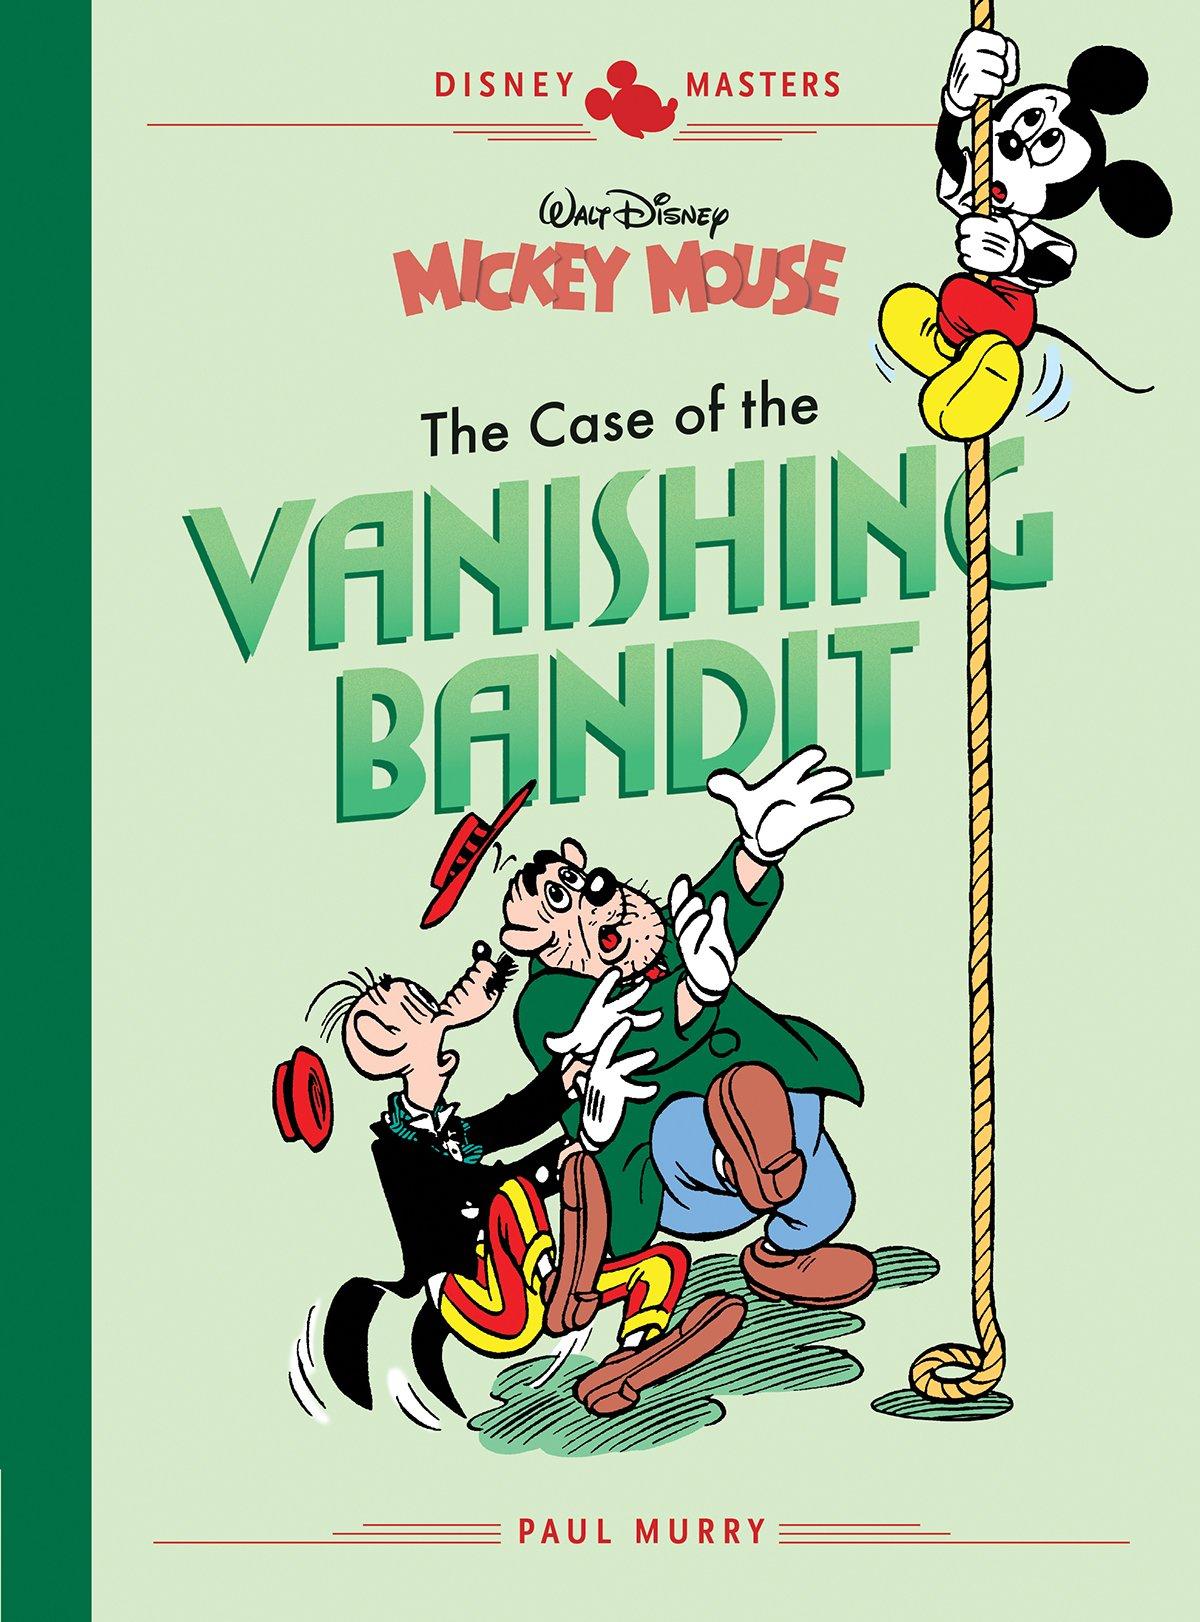 Disney Masters Vol. 3: Paul Murry: Walt Disney's Mickey Mouse: The Case Of The Vanishing Bandit